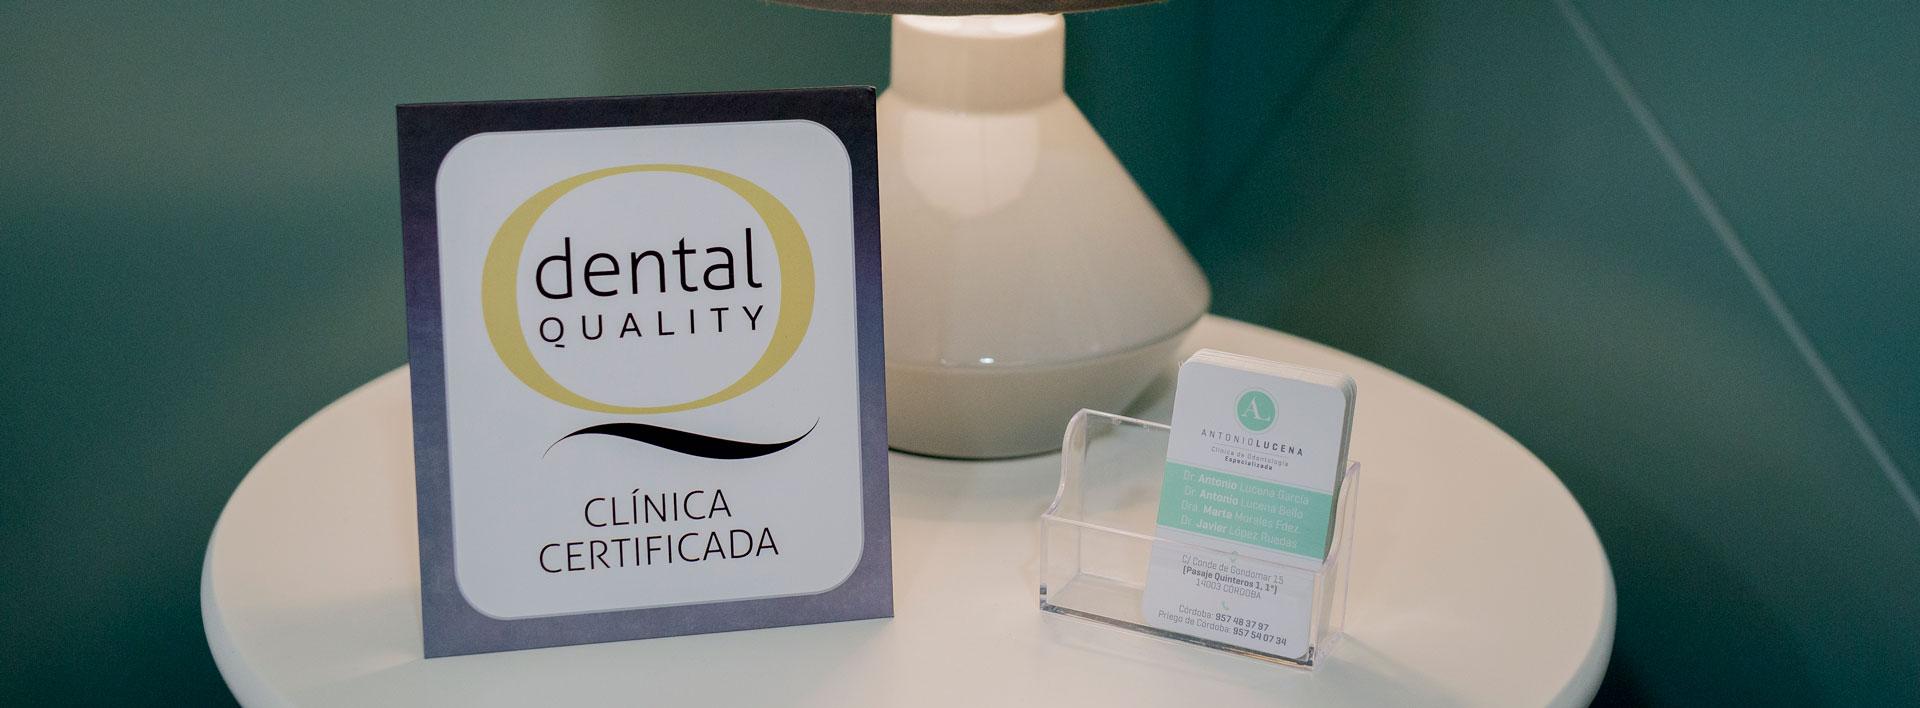 Certificado de calidad Dental Quality Antonio Lucena